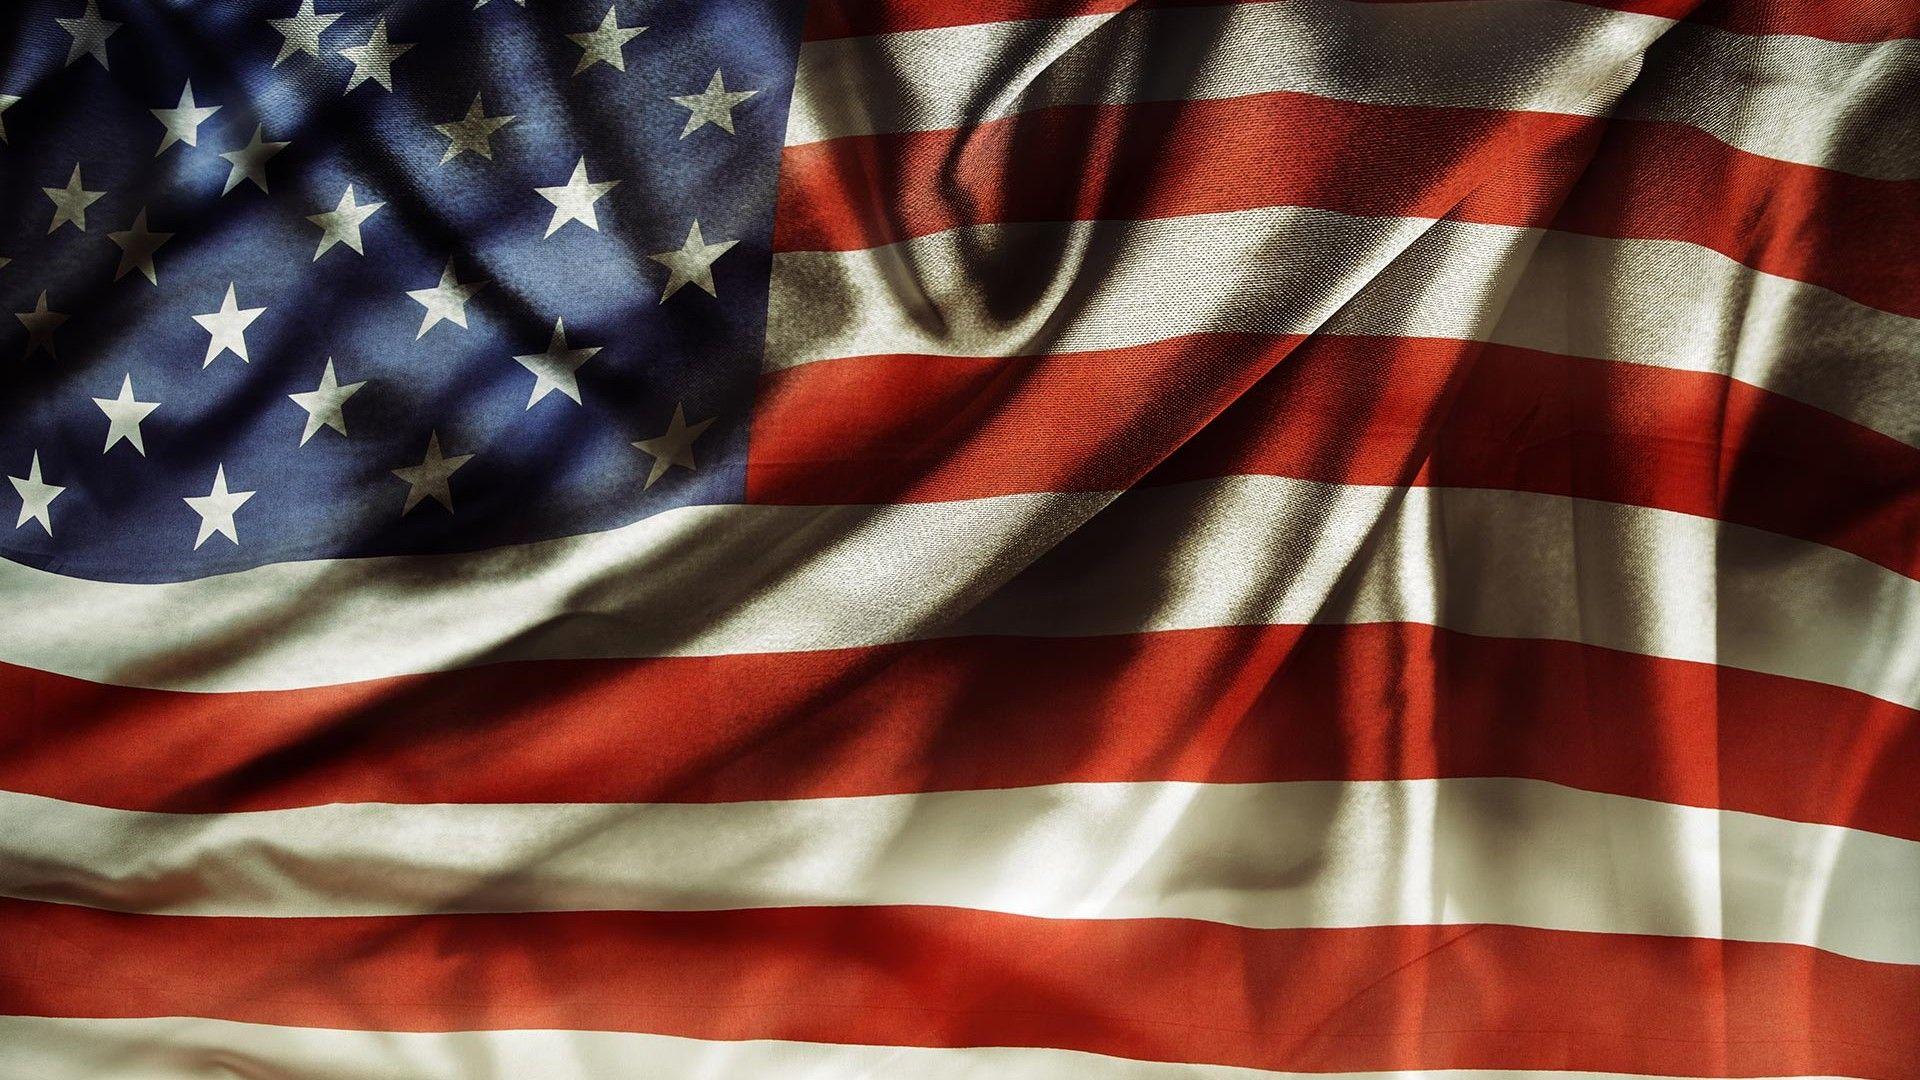 Live Wallpaper Hd American Flag Wallpaper Wallpaper Best Wallpaper Hd